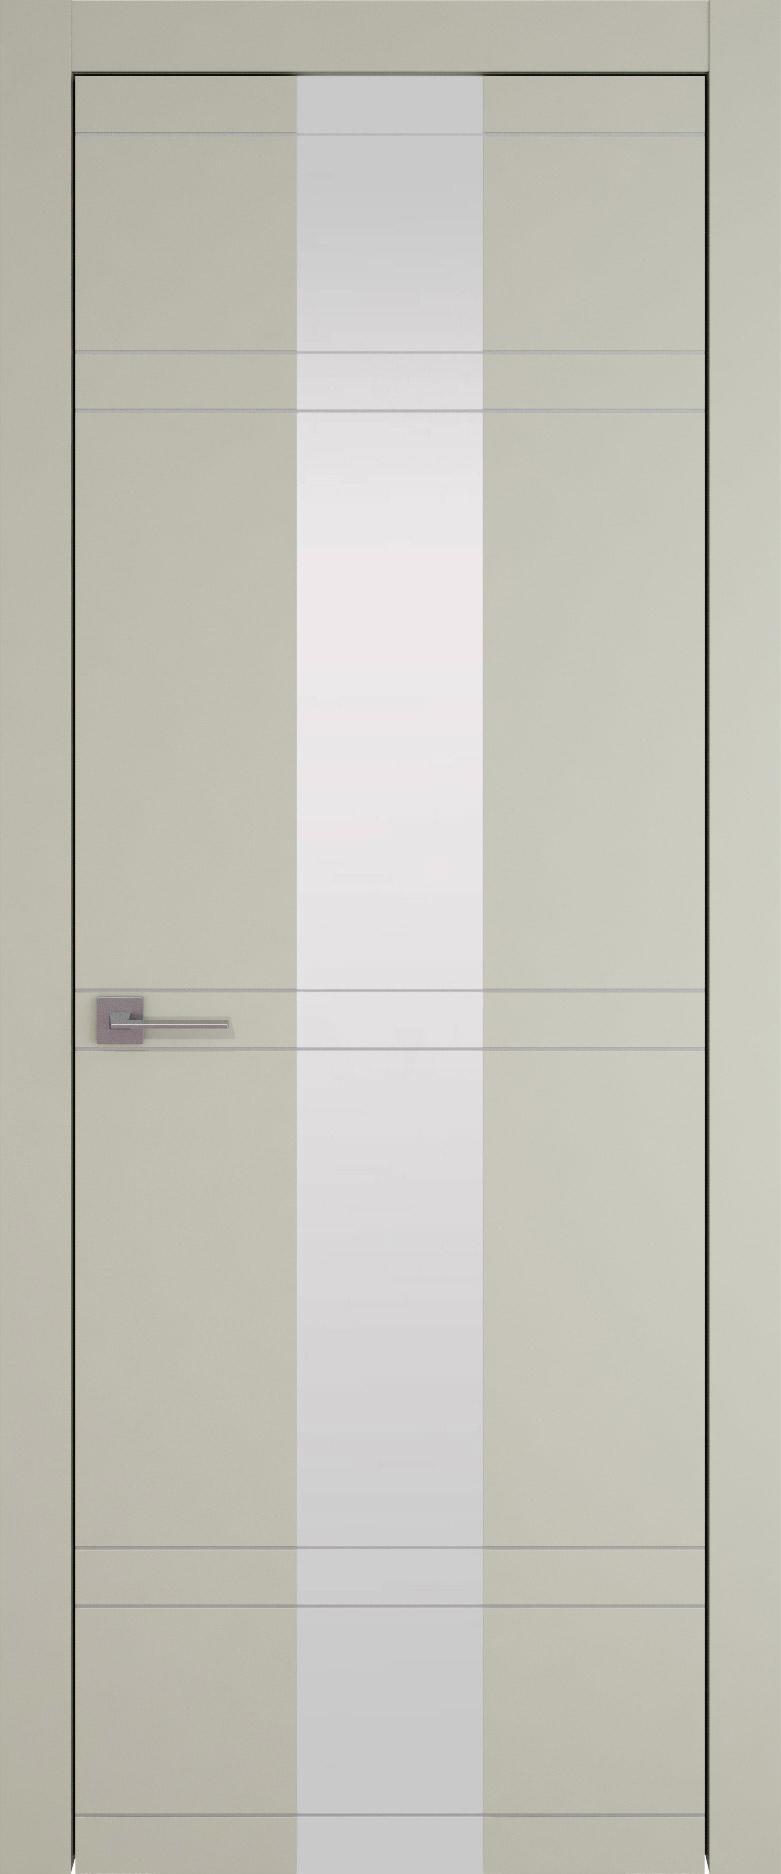 Tivoli Ж-4 цвет - Серо-оливковая эмаль (RAL 7032) Со стеклом (ДО)